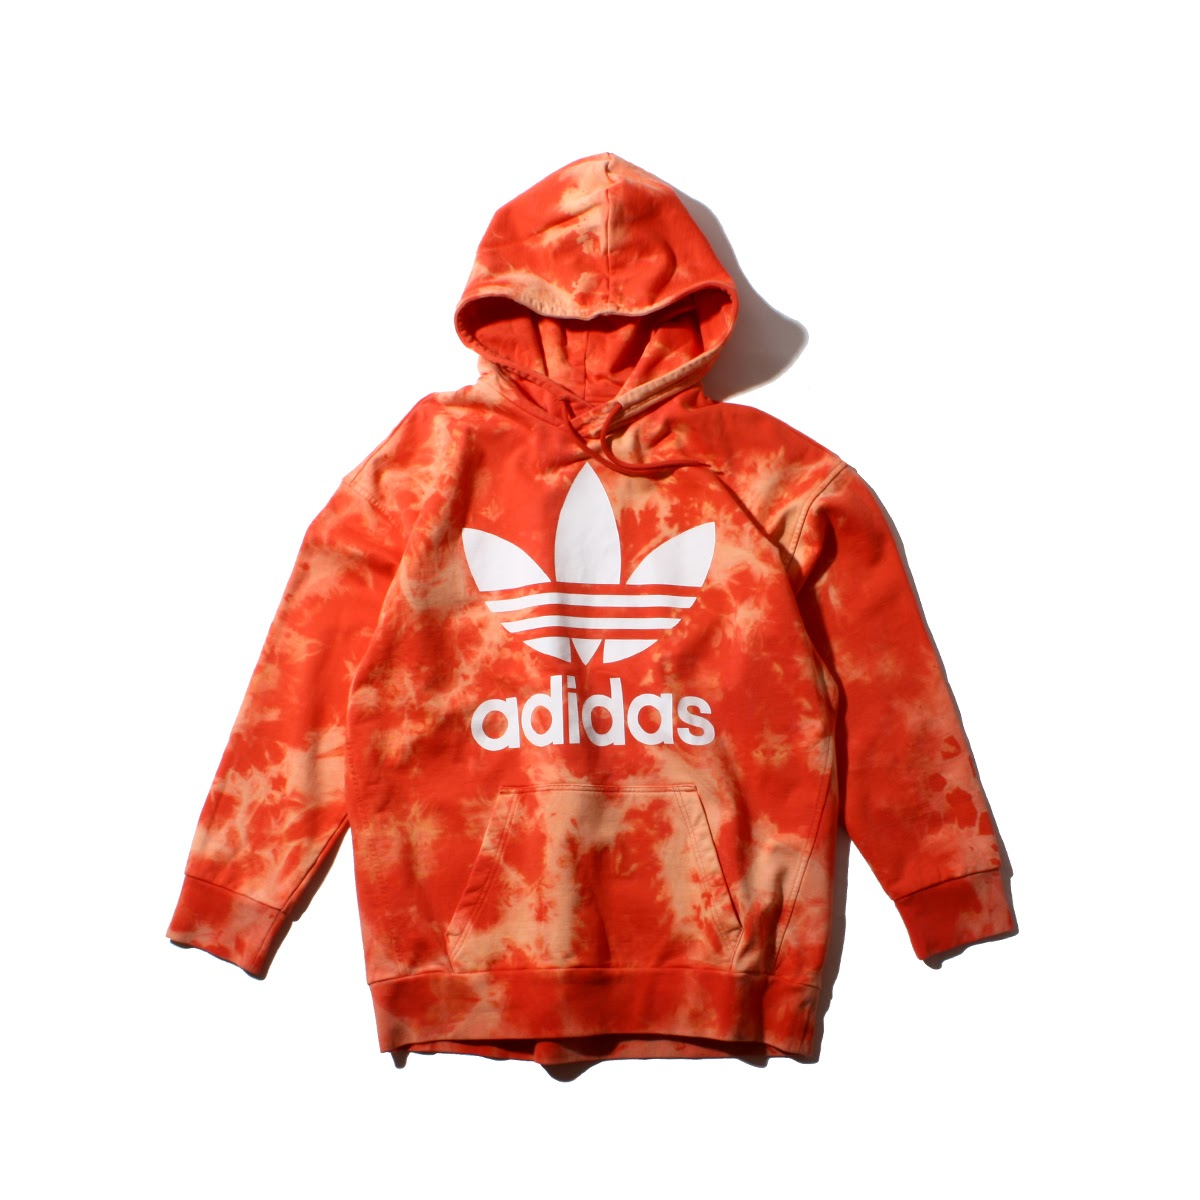 adidas Originals TIE DYE HOODIE (アディダス オリジナルス タイダイ フーディー) Trace Scarlet【メンズ パーカー】18SS-S